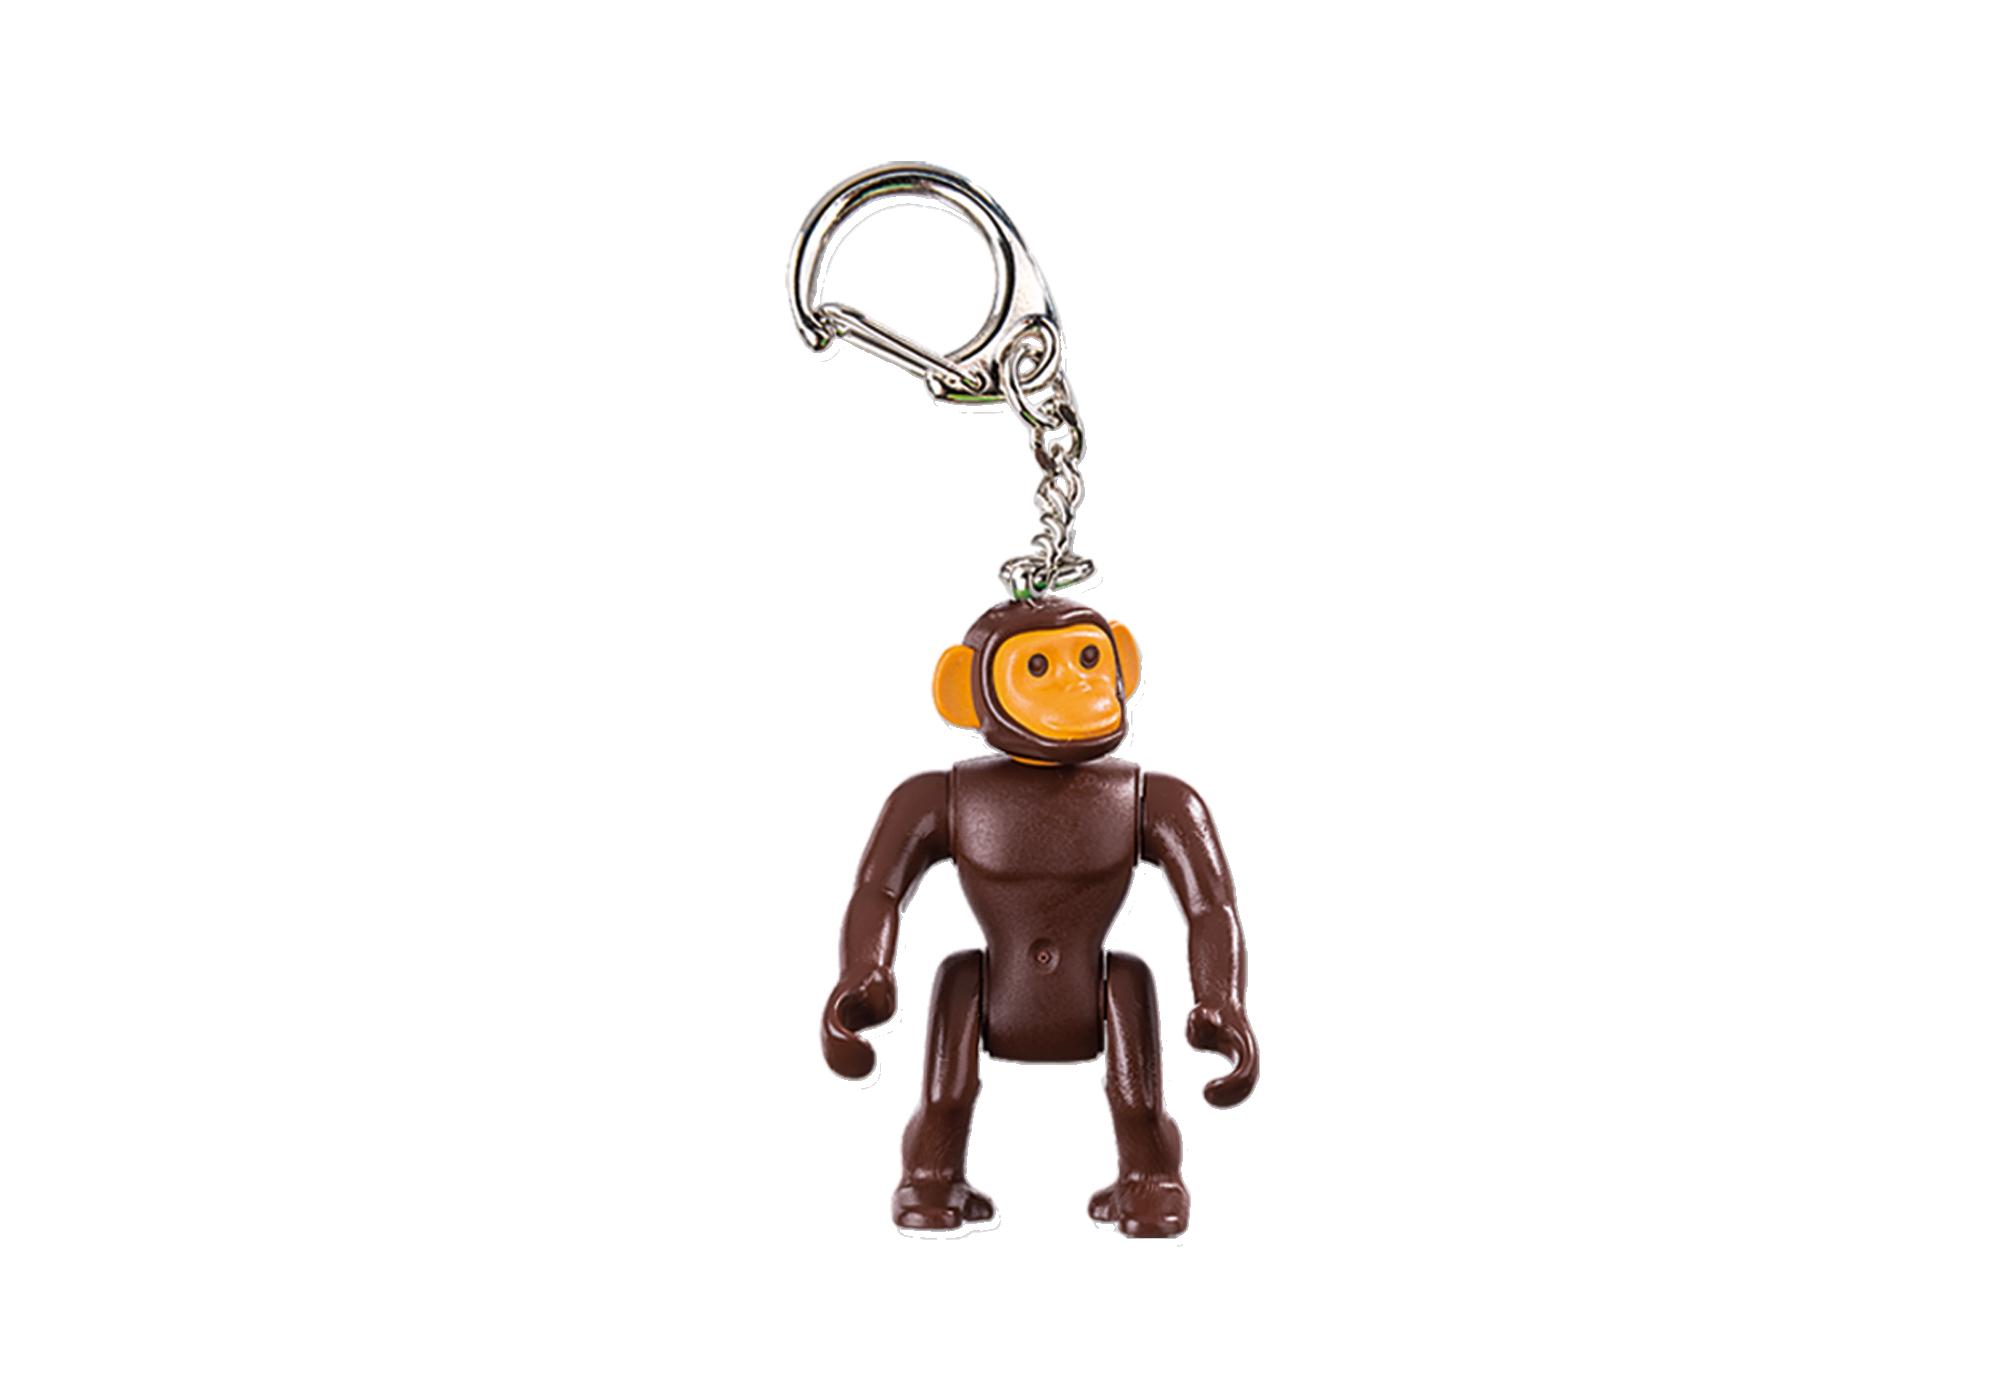 http://media.playmobil.com/i/playmobil/6611_product_detail/Schlüsselanhänger Schimpanse